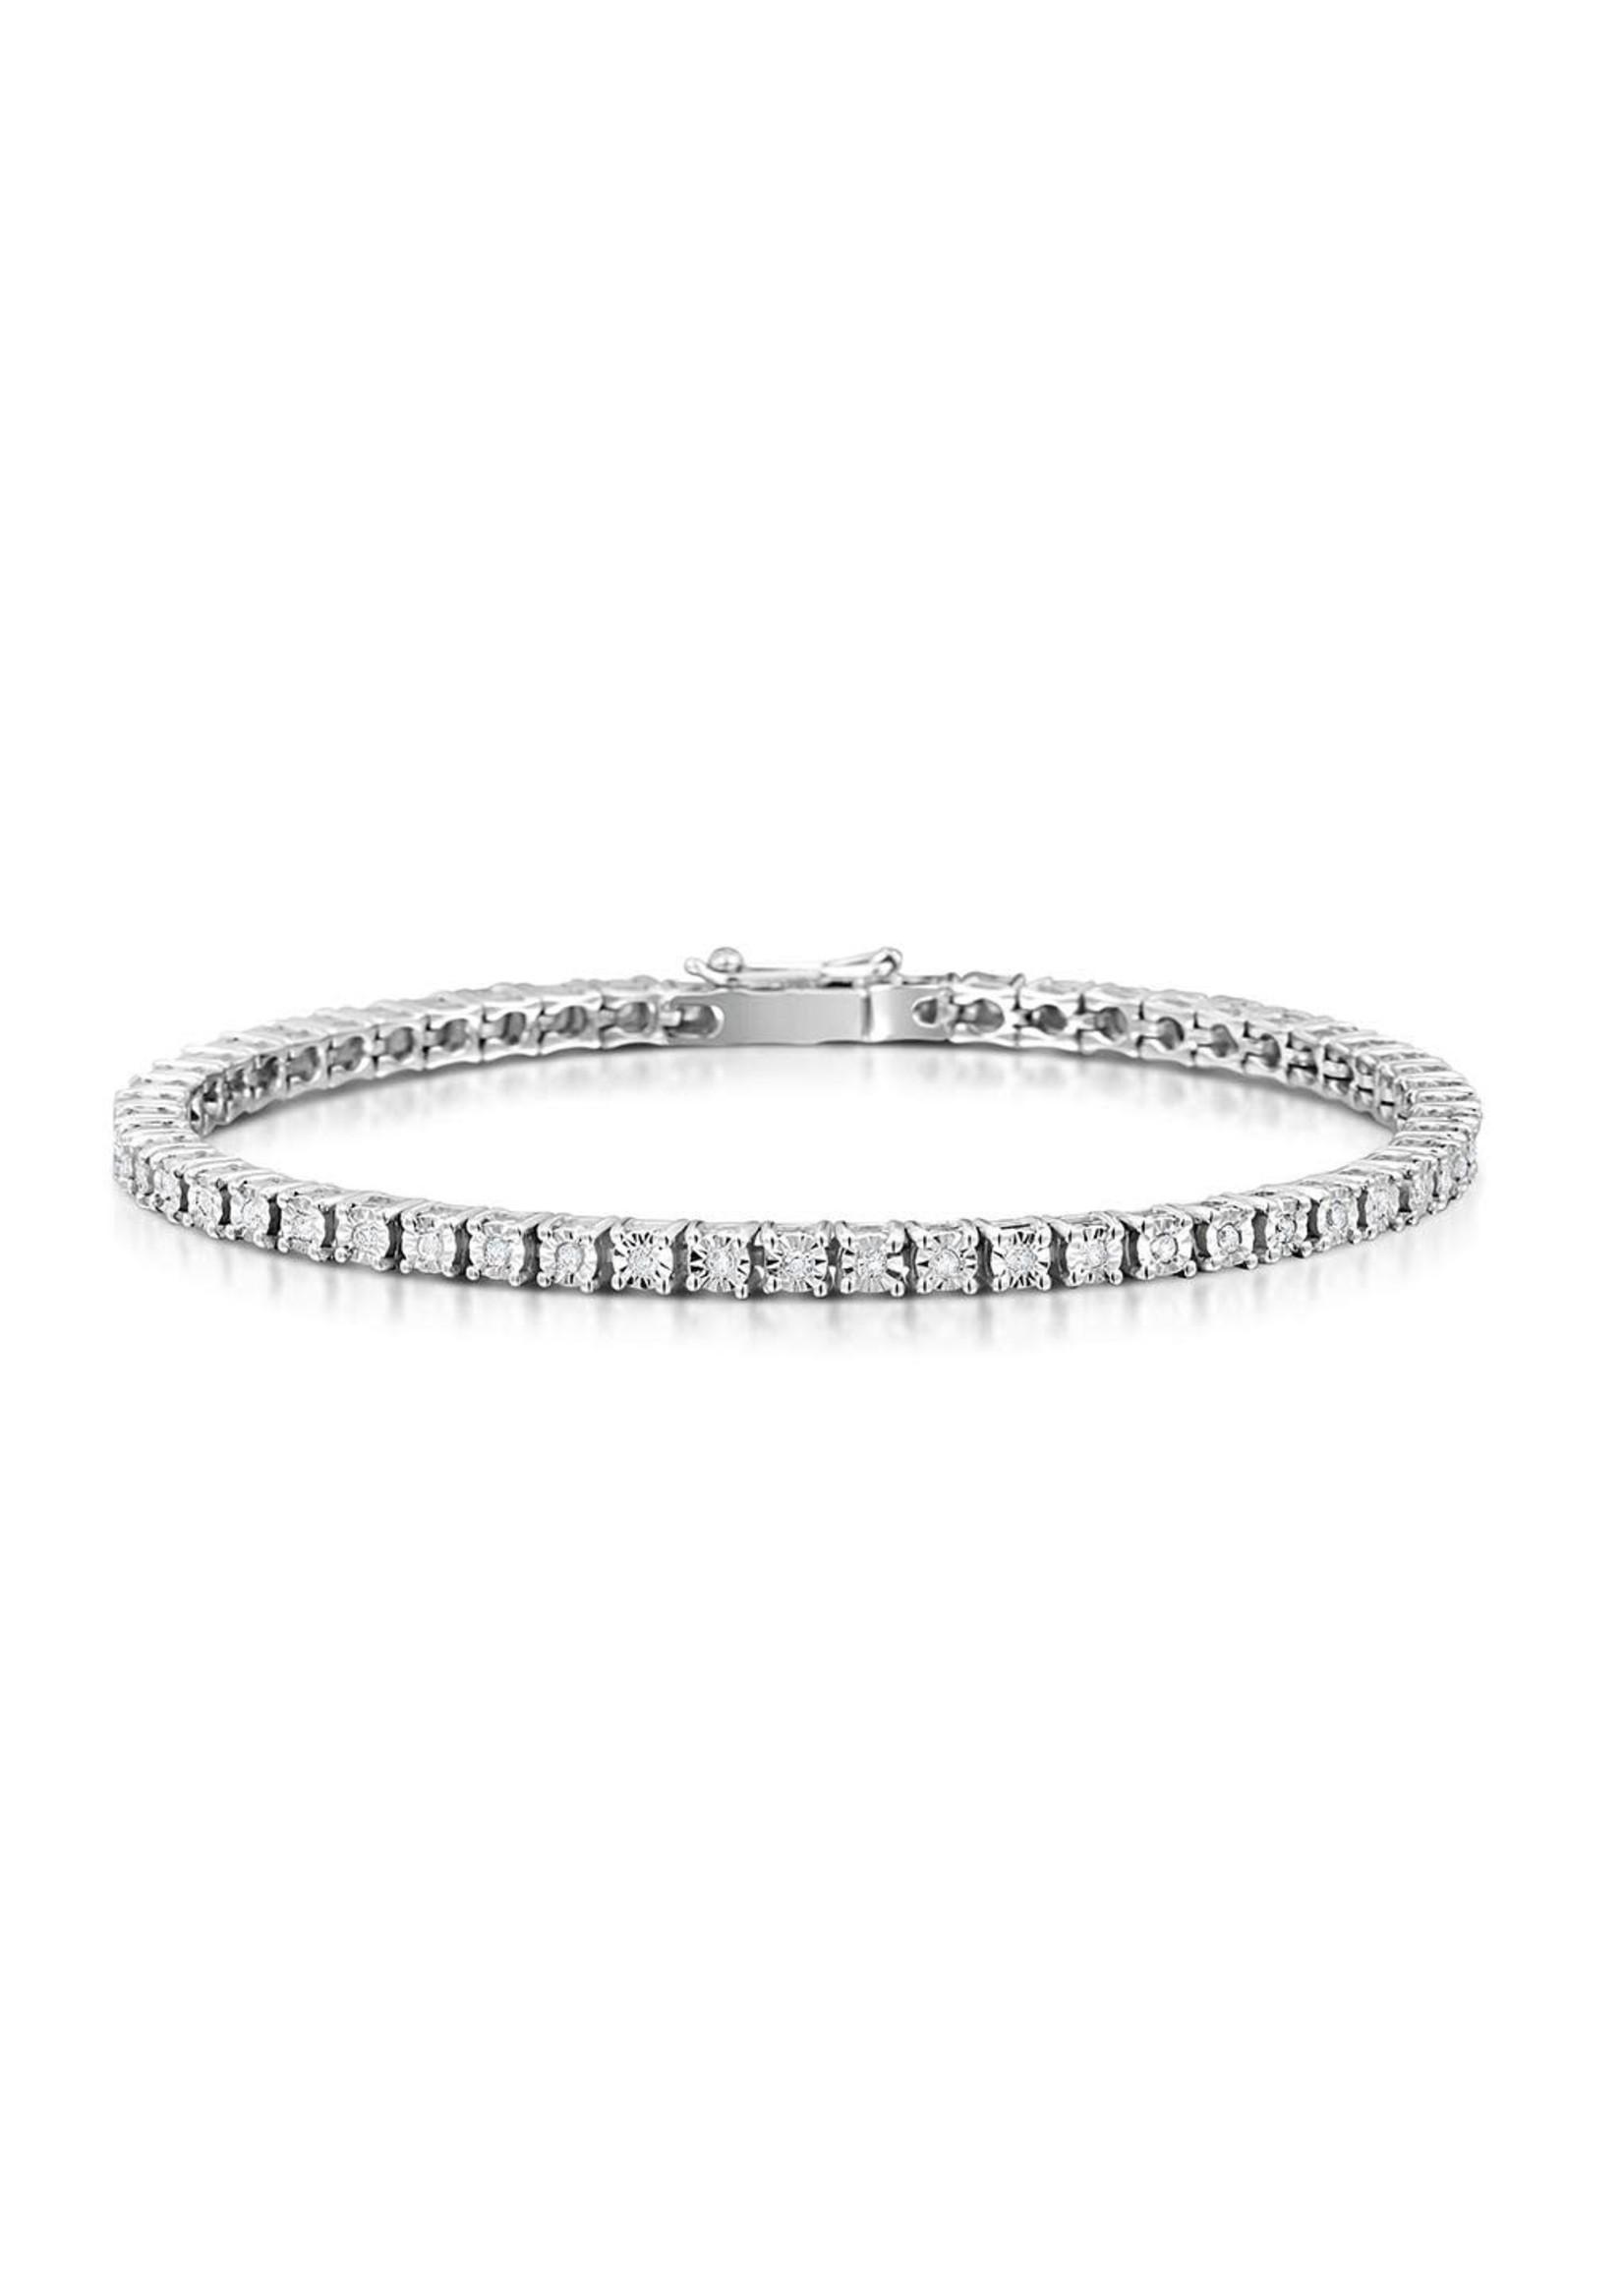 Jewellery 9CT TENNIS BRACELET VS-SI G .7PT EACH